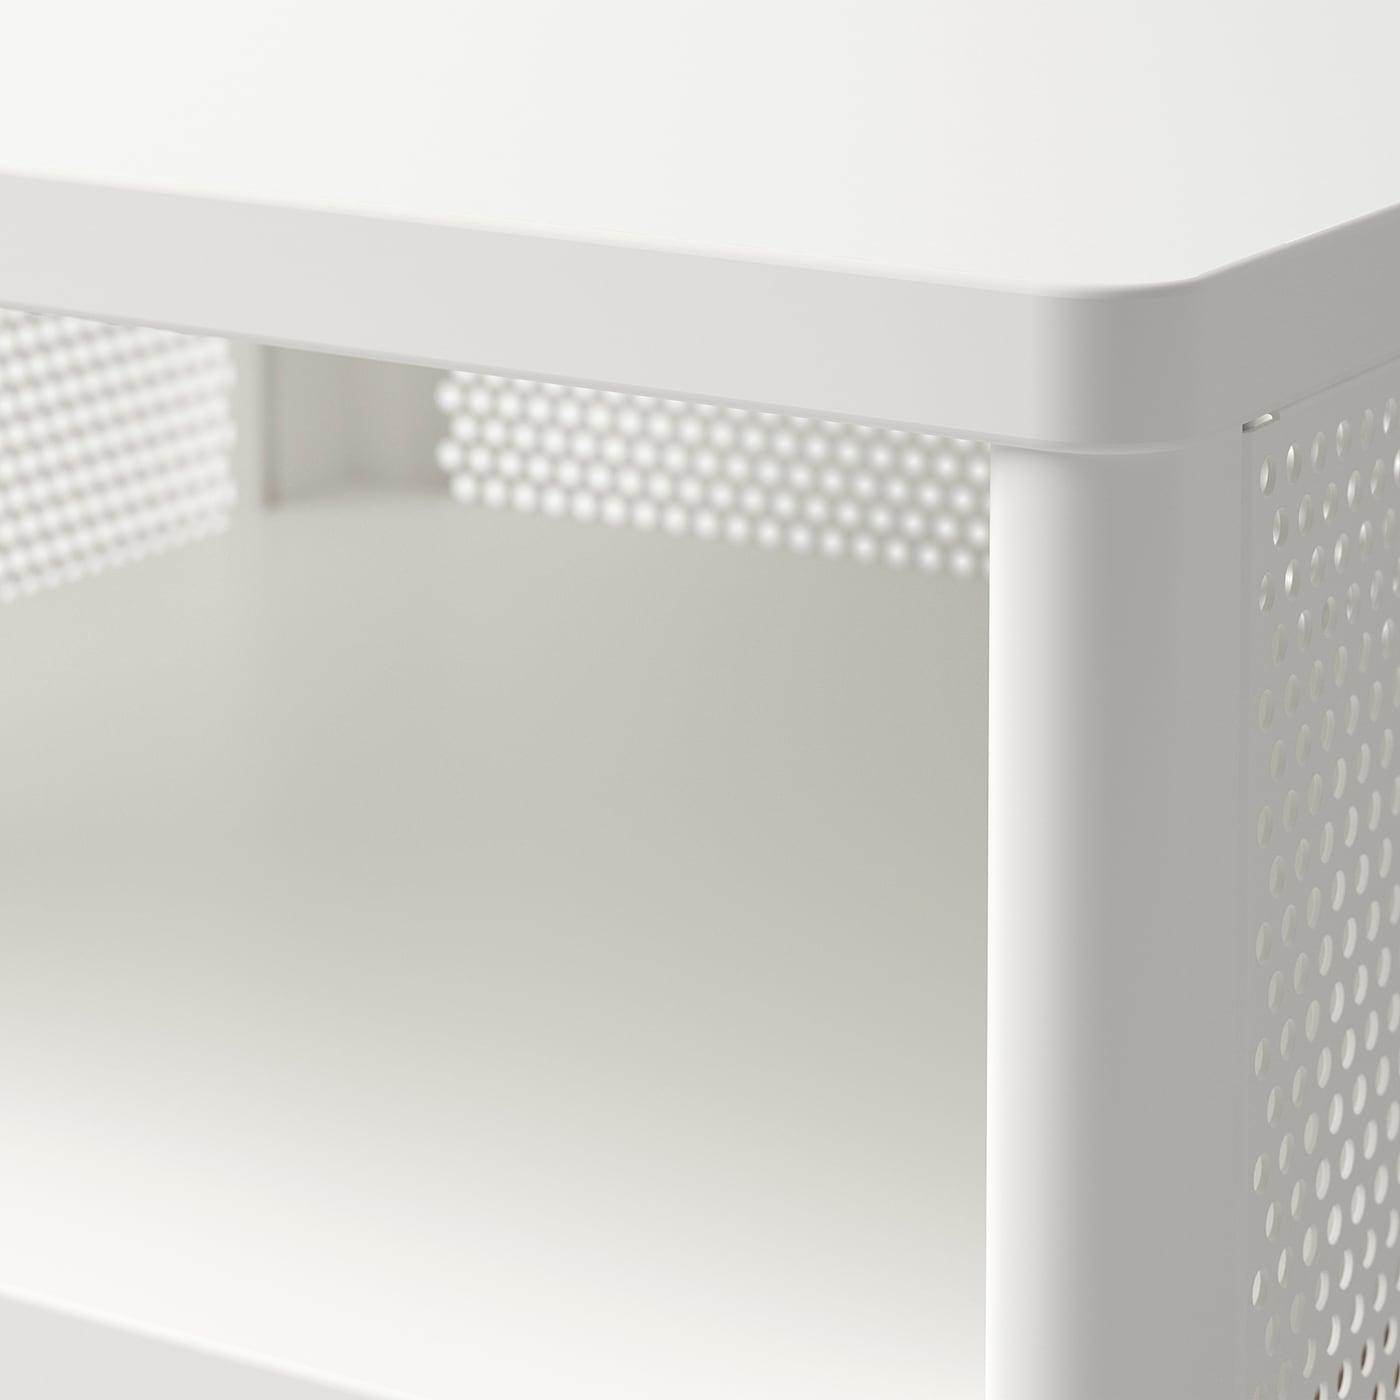 BEKANT وحدة تخزين بأرجل, فتحة شبكة أبيض, 41x61 سم